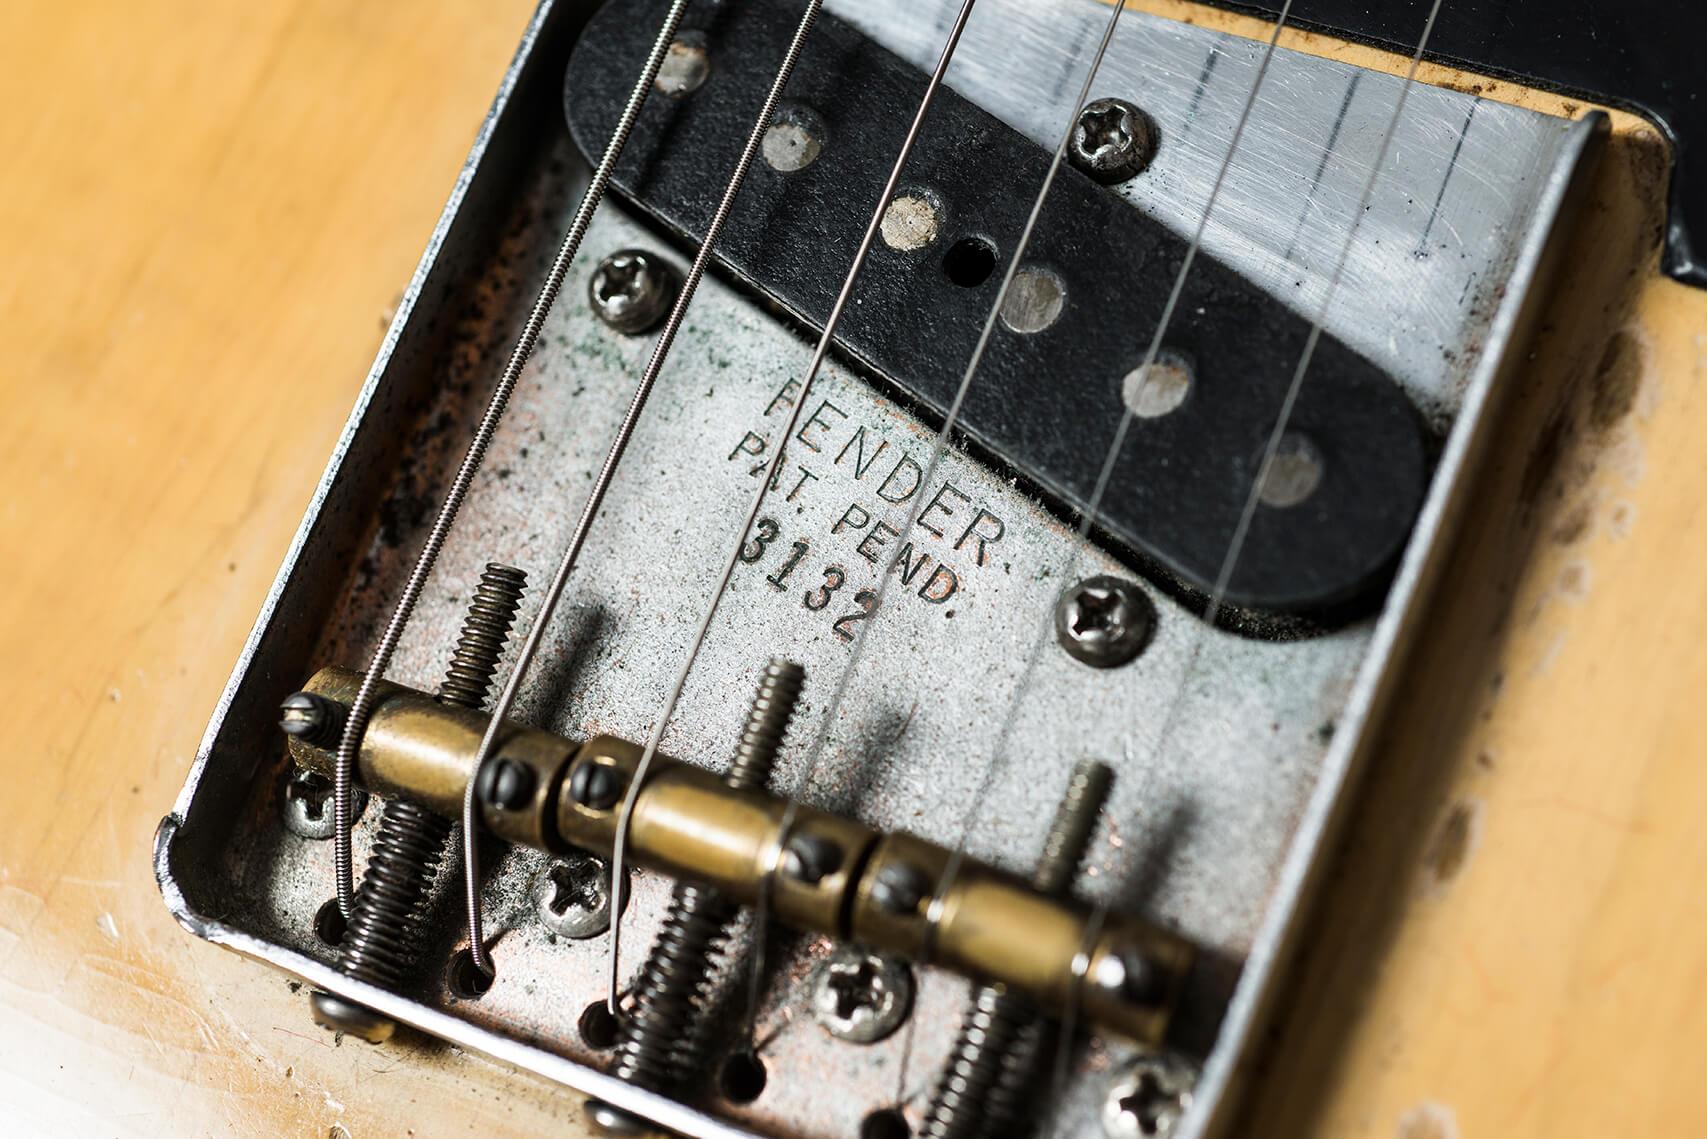 Jeff Garlin's 1953 Fender Telecaster Bridge